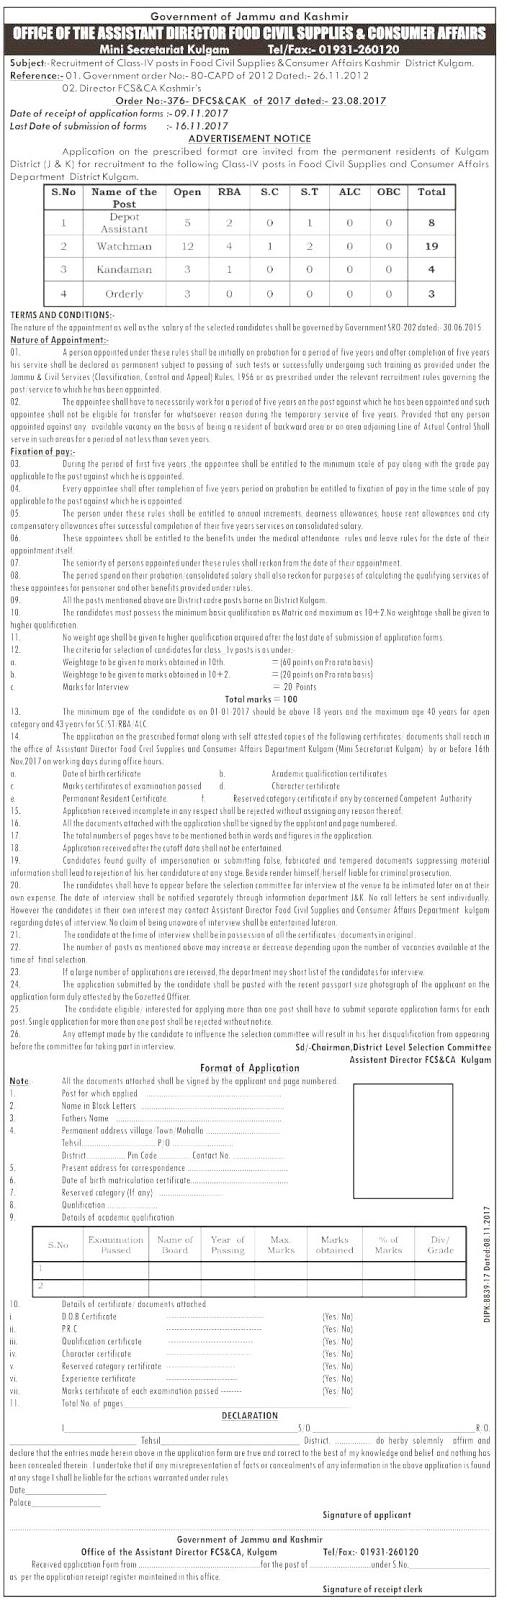 J&K Food Civil Supplies & Consumer Affairs Department Class IV Recruitment 2017